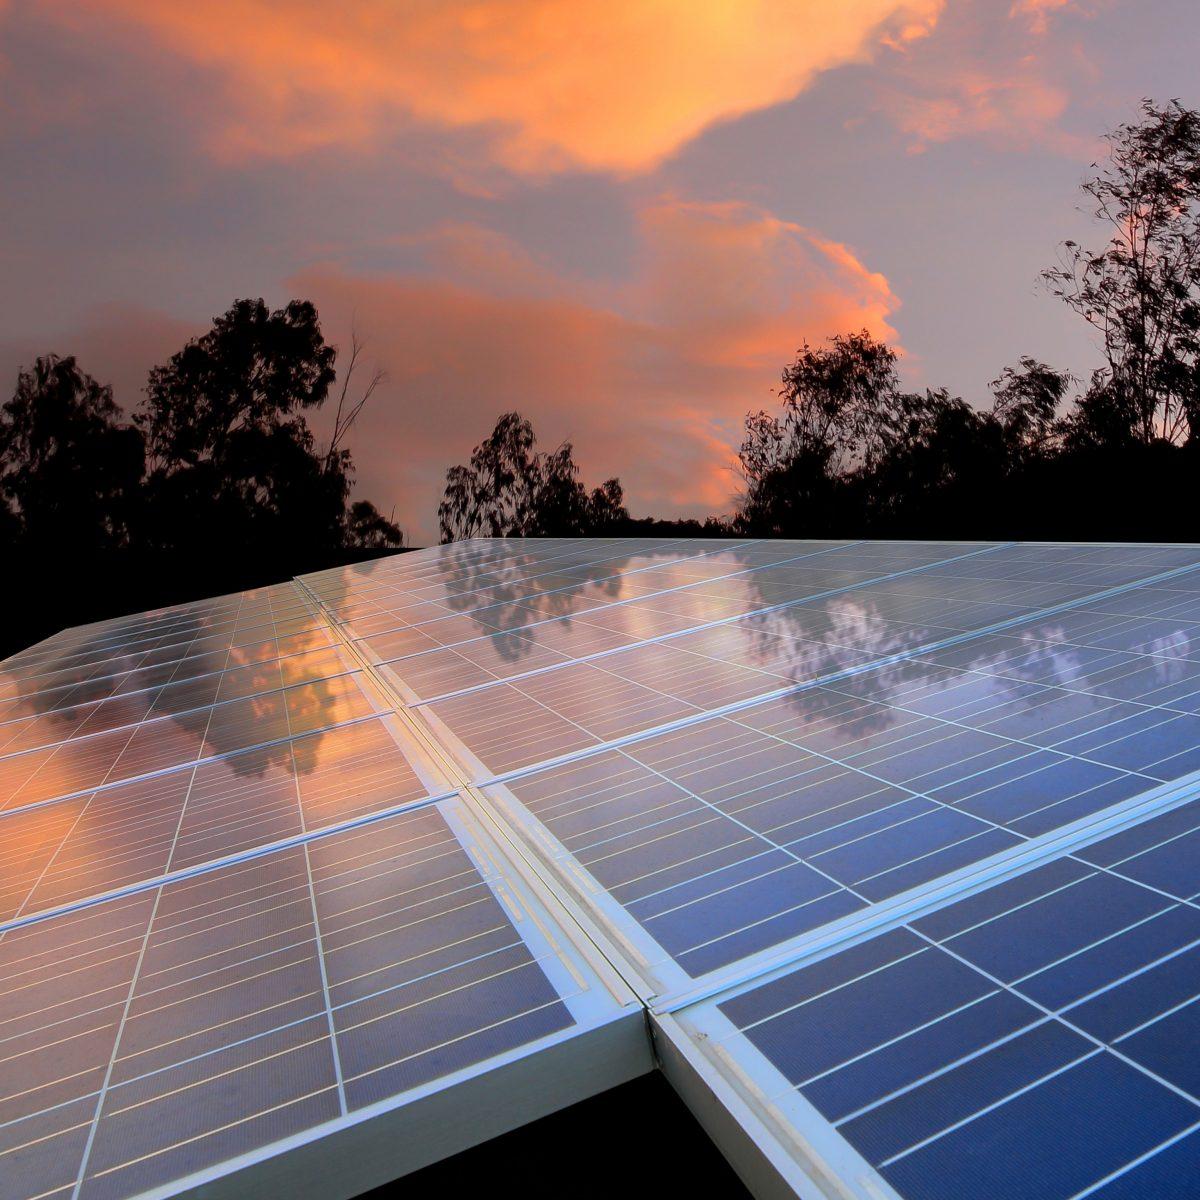 Solar Panel im Sonnenuntergang